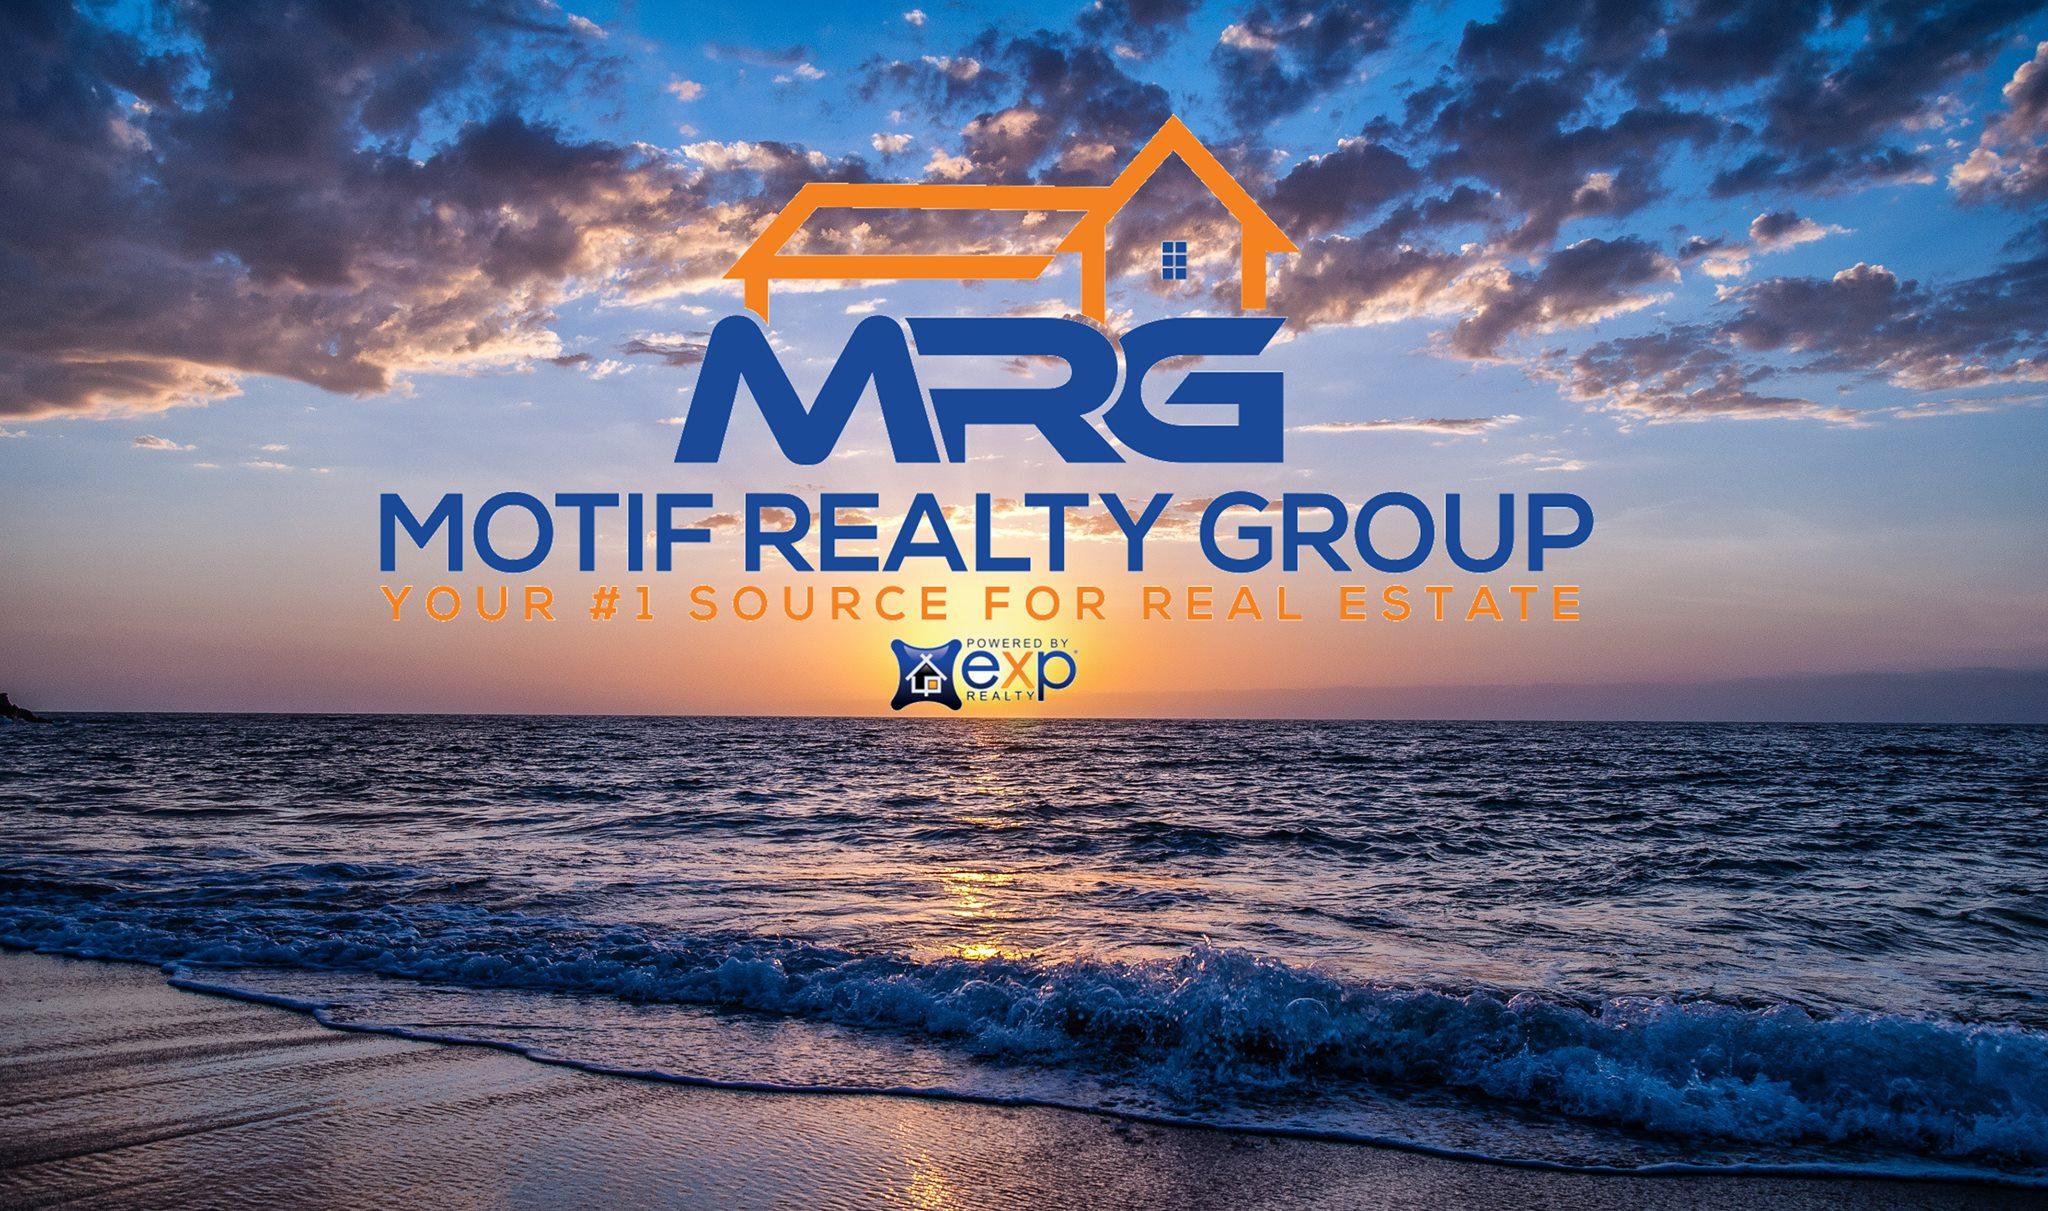 Motif Realty Group